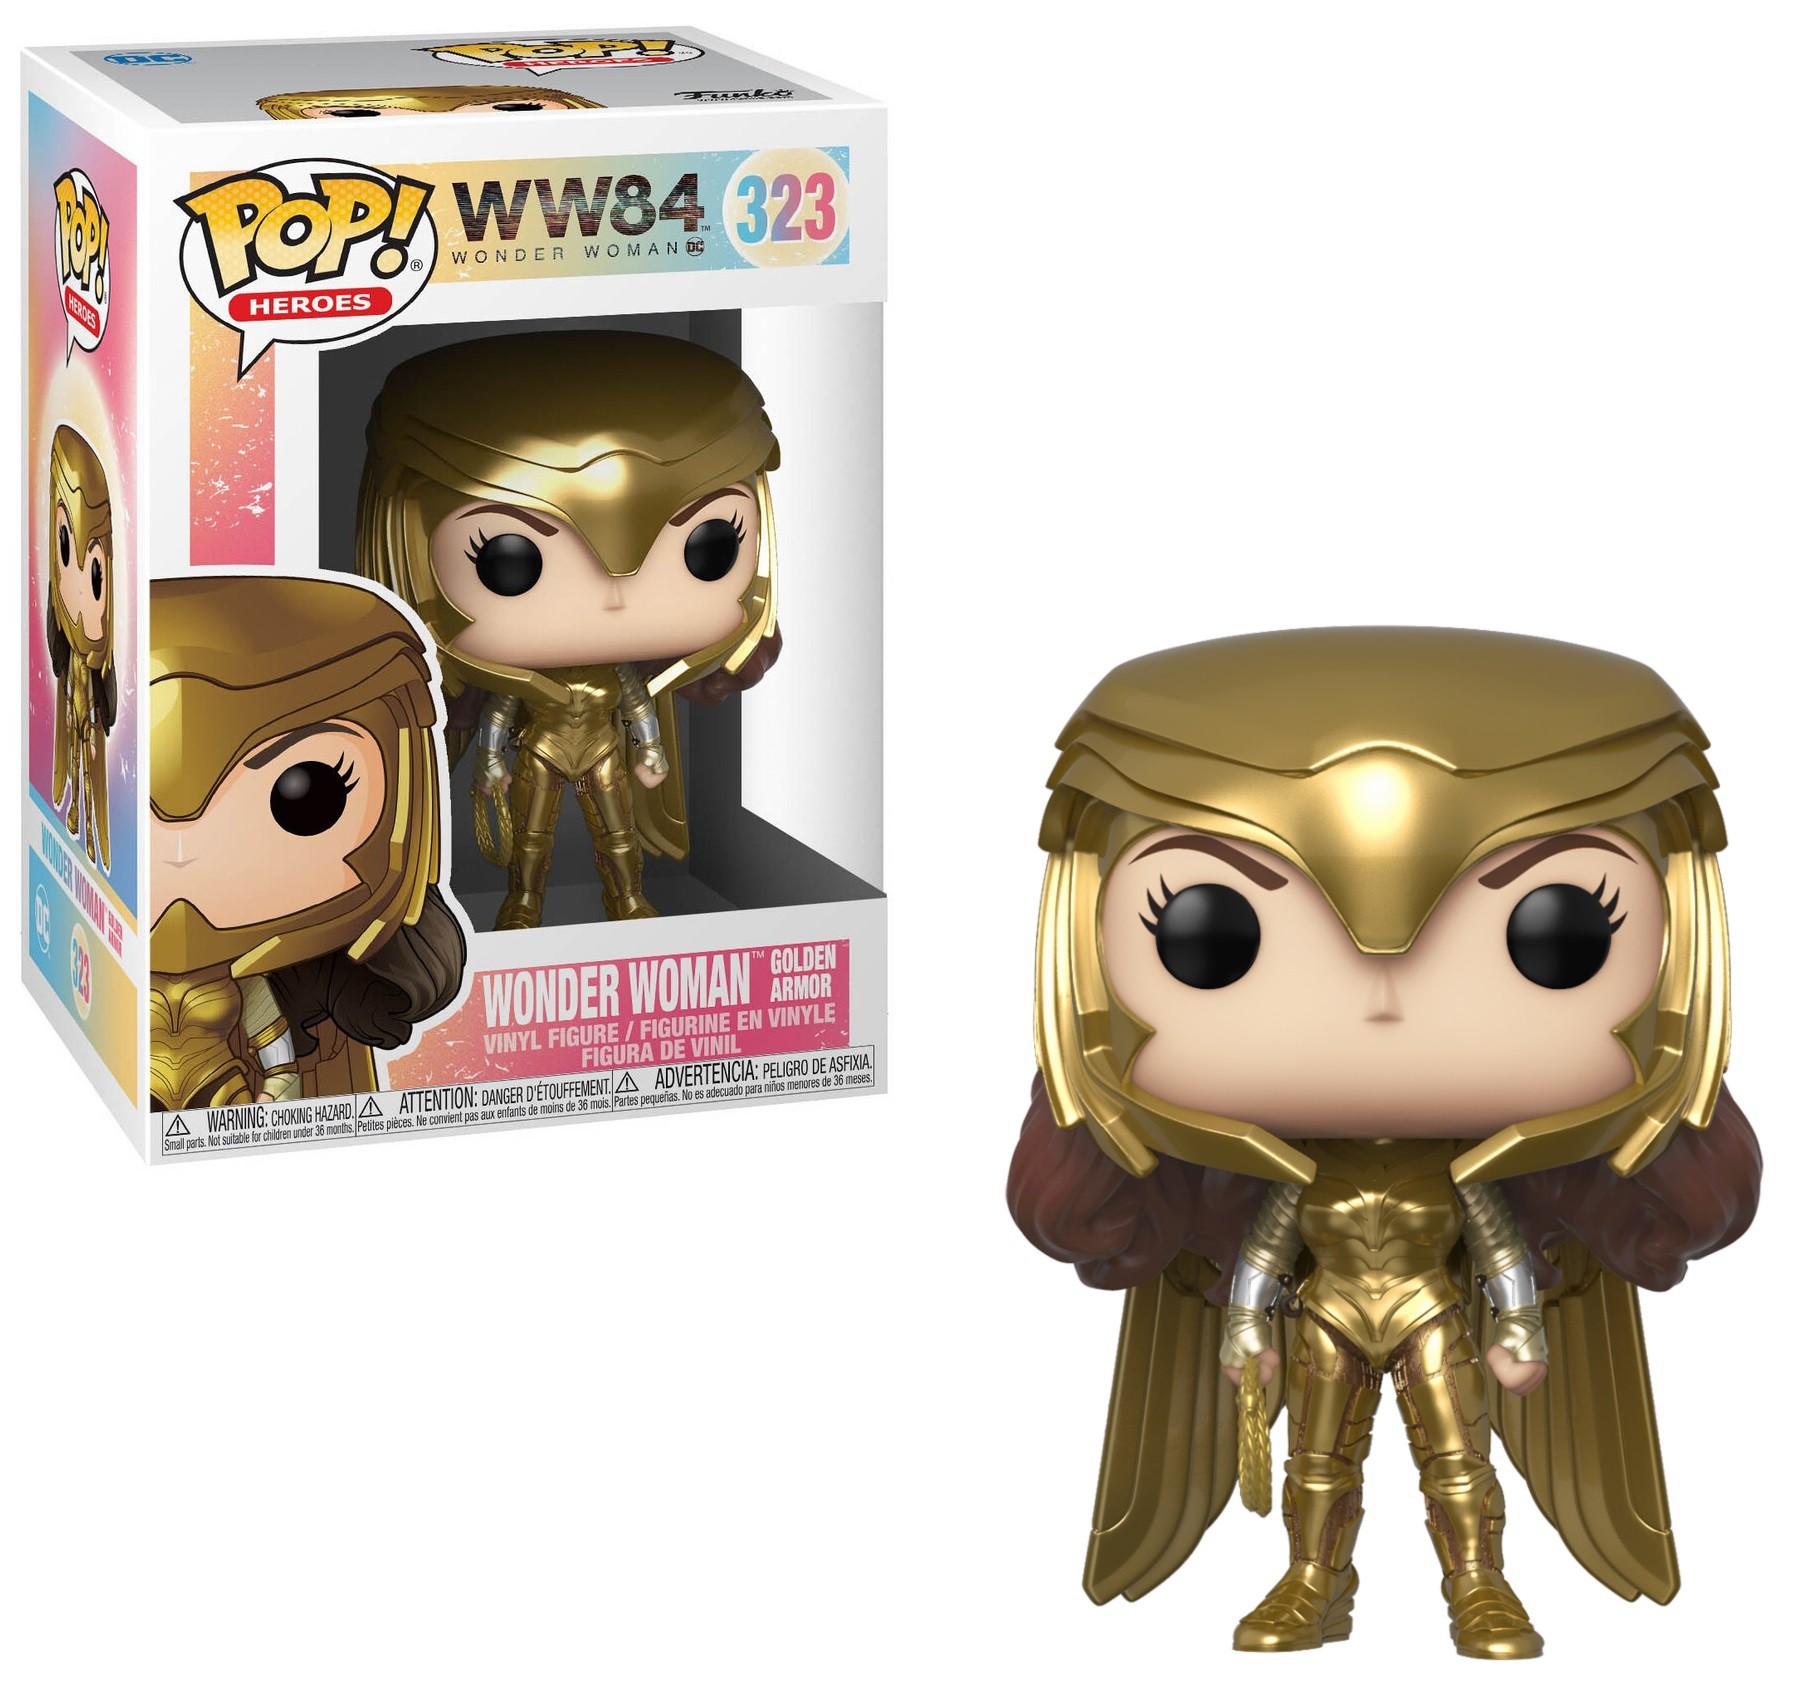 Funko POP! DC Wonder Woman 1984 Wonder Woman Golden Armor ver1 #323